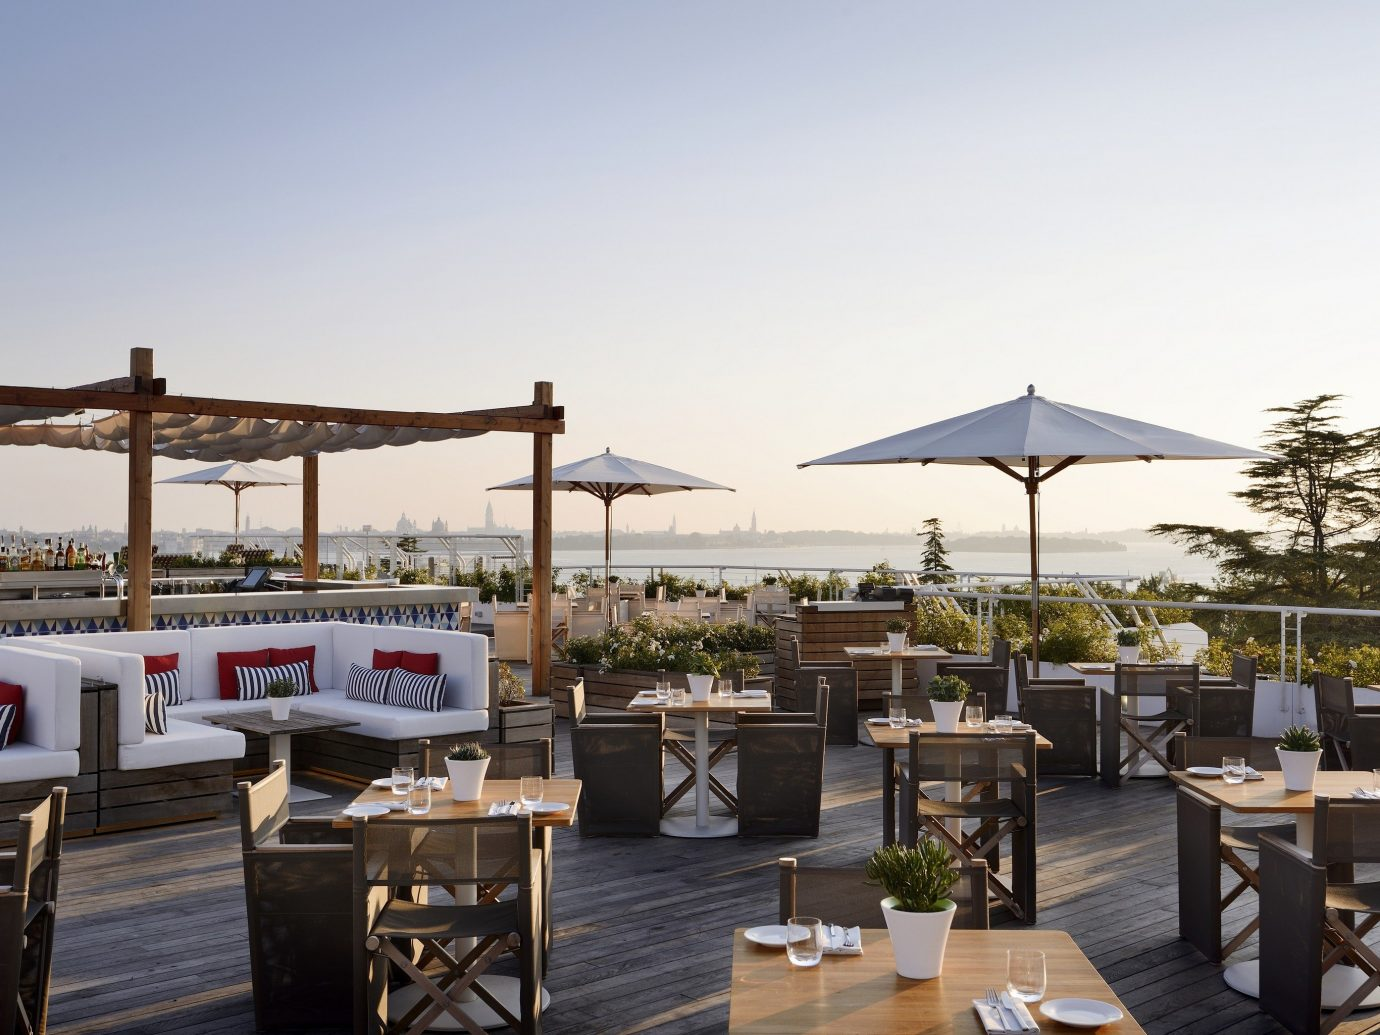 Hotels Italy Luxury Travel Venice sky restaurant Resort furniture several